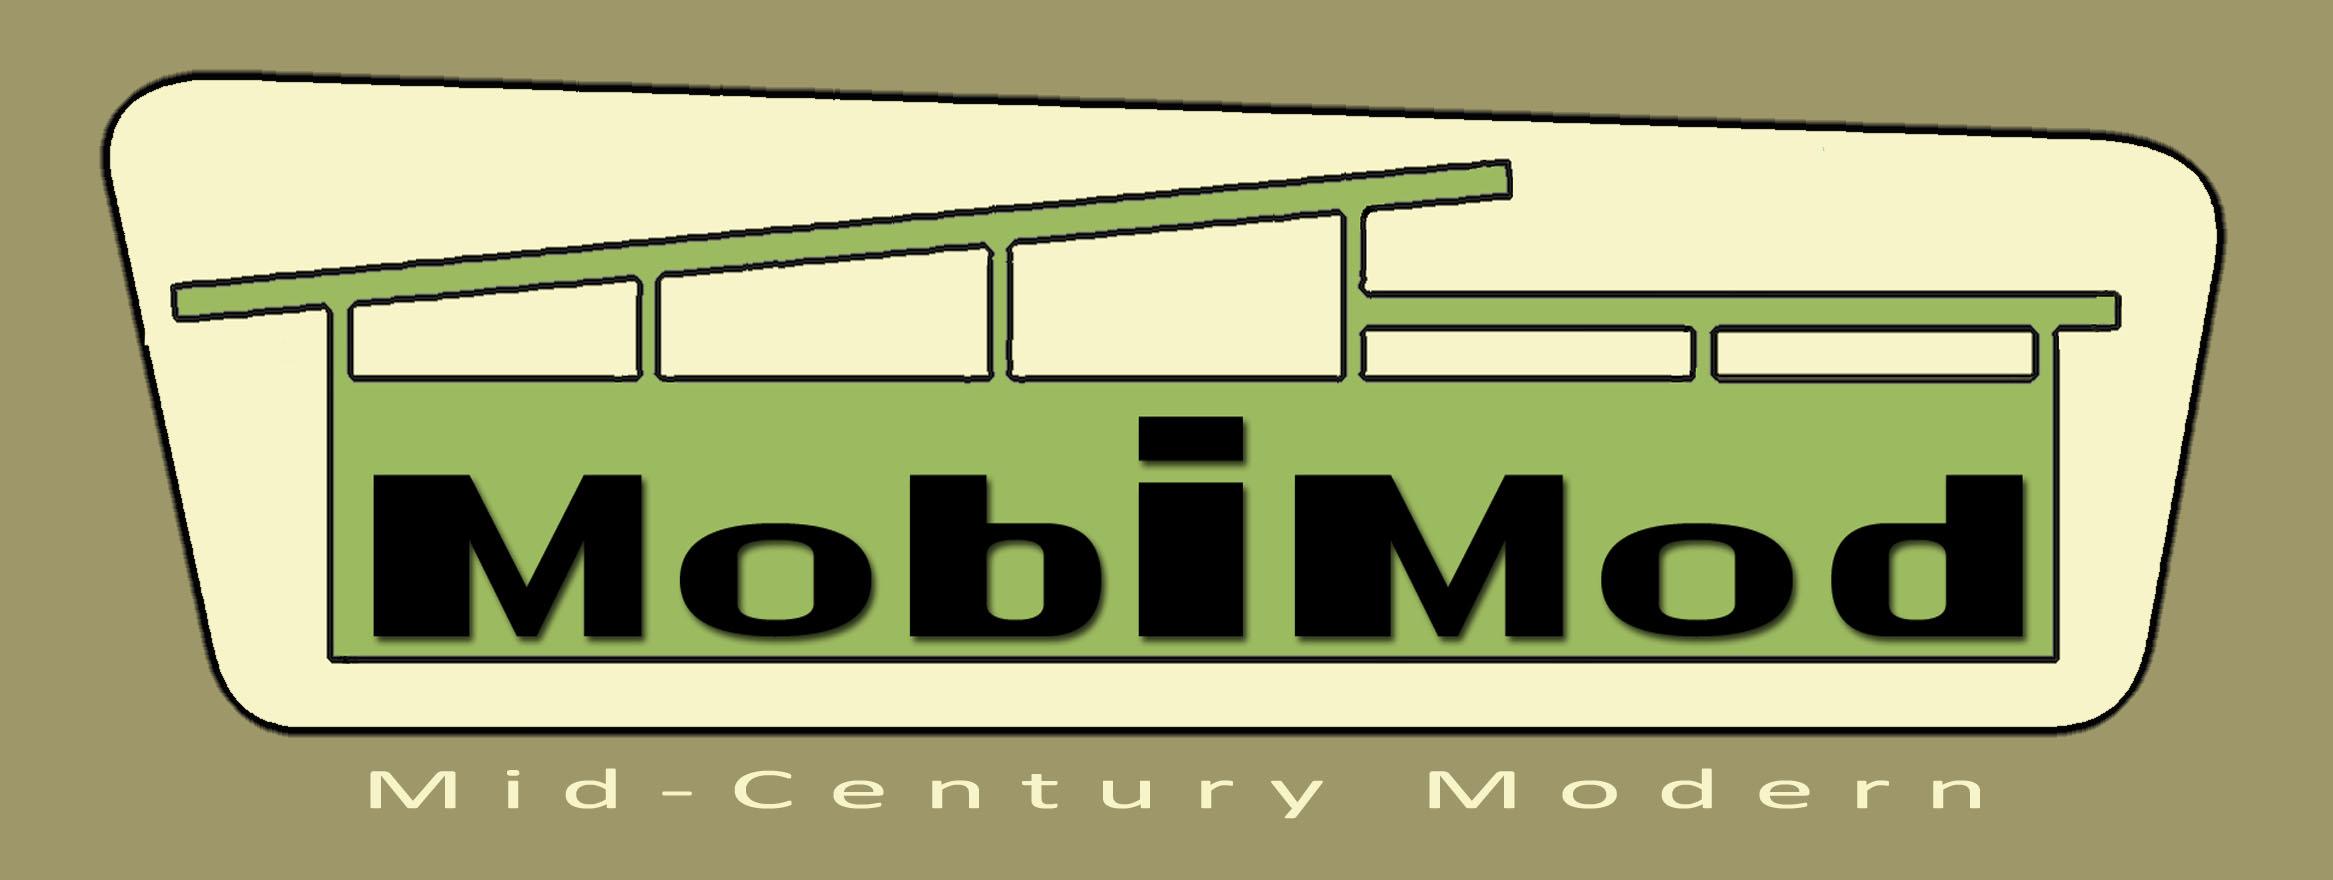 Mobi-Mod vintage graphic logo